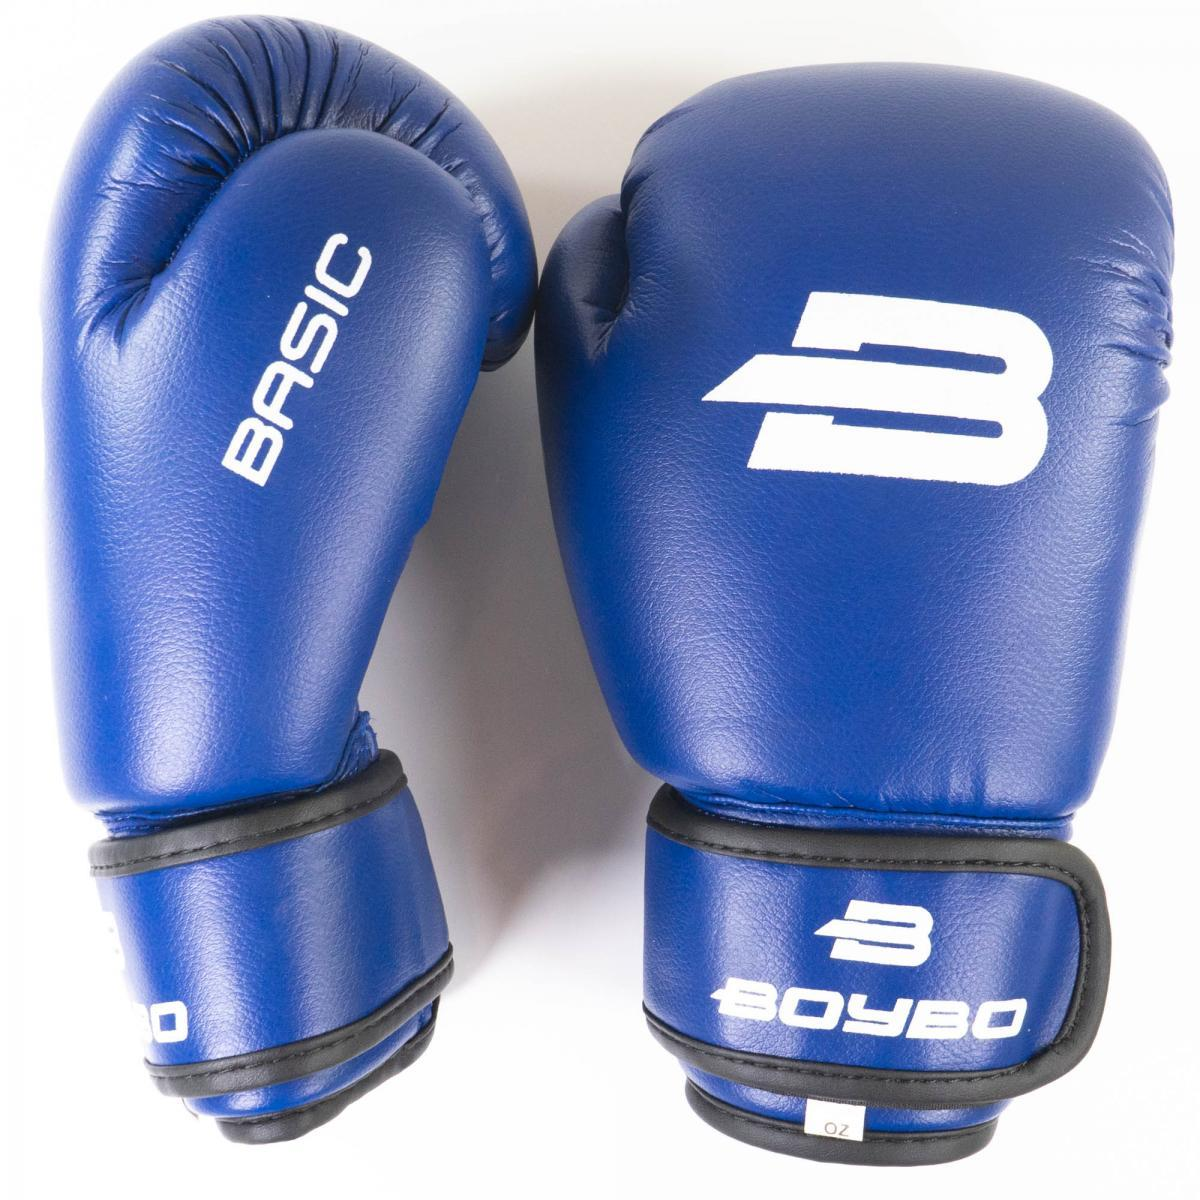 Перчатки бокс. BoyBo Basic к/з 10 OZ син. SF1-44-10